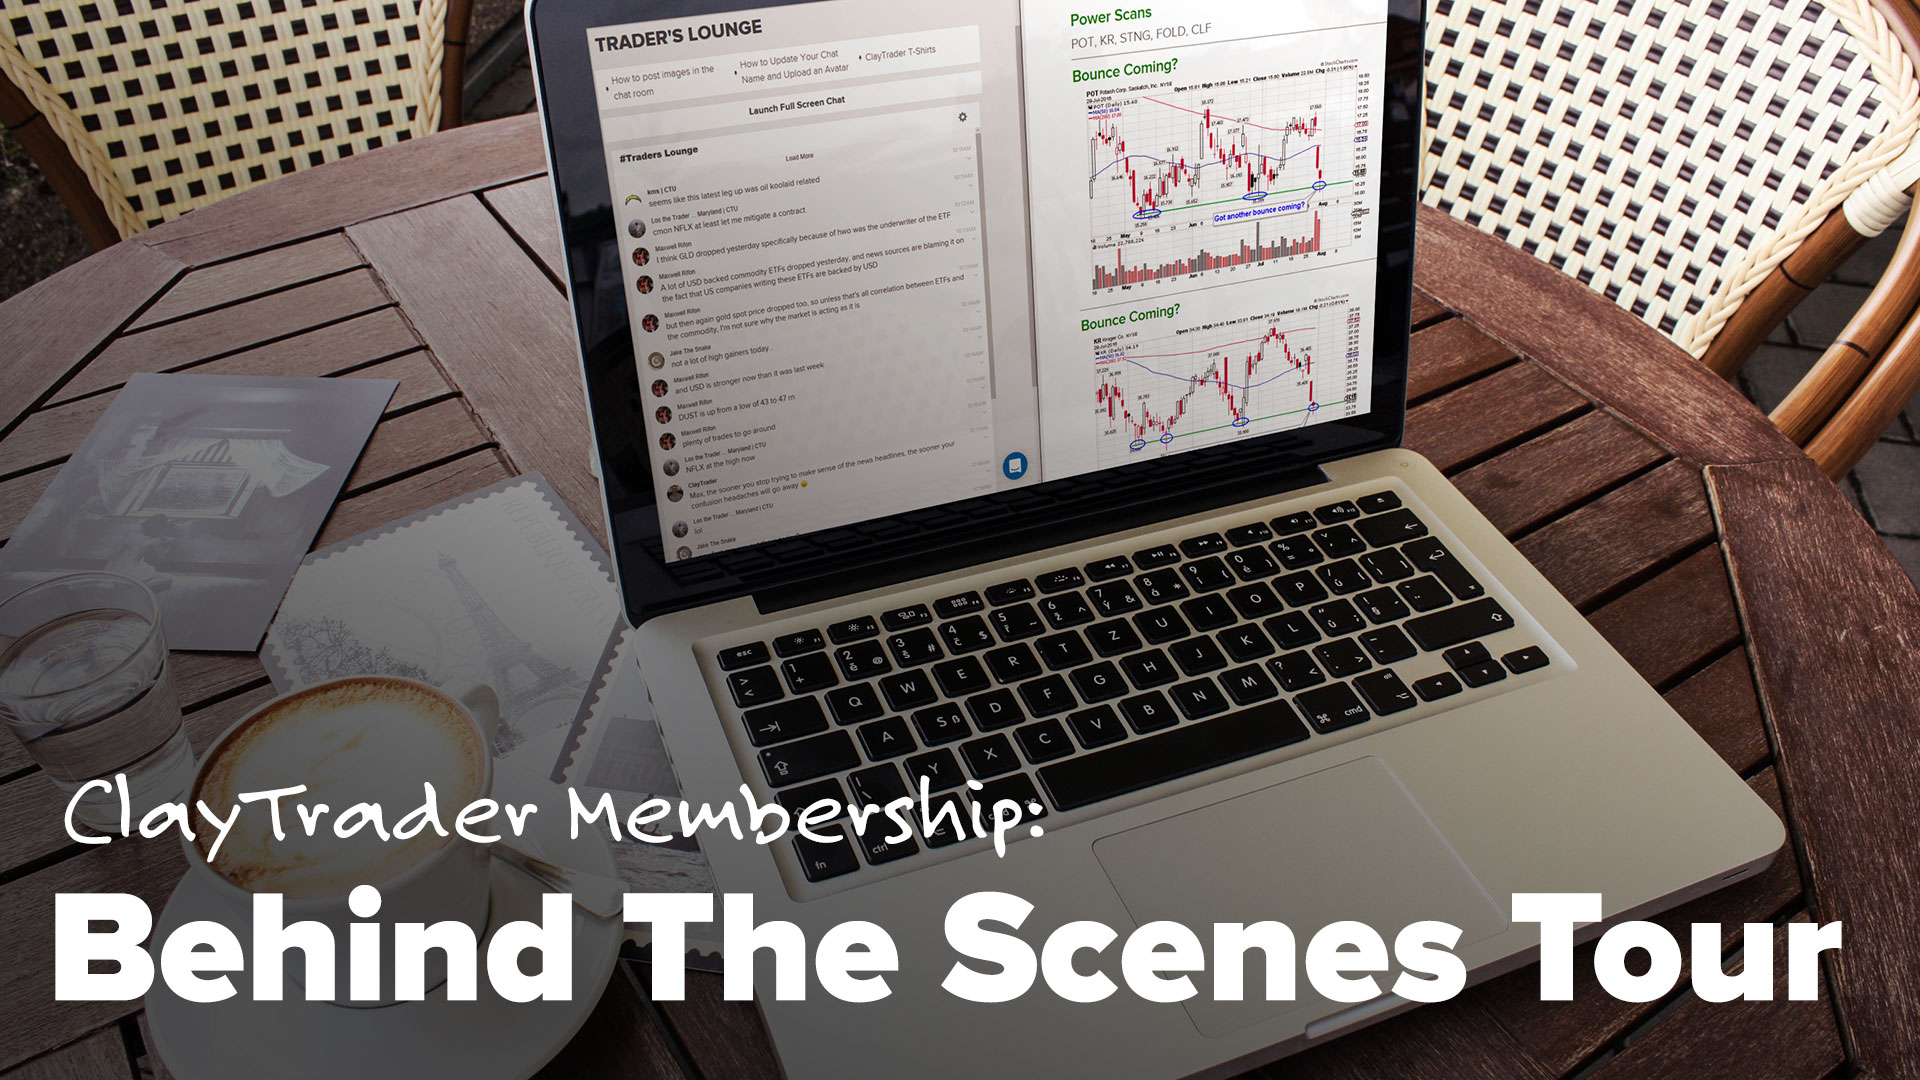 ClayTrader Membership: Behind the Scenes Tour